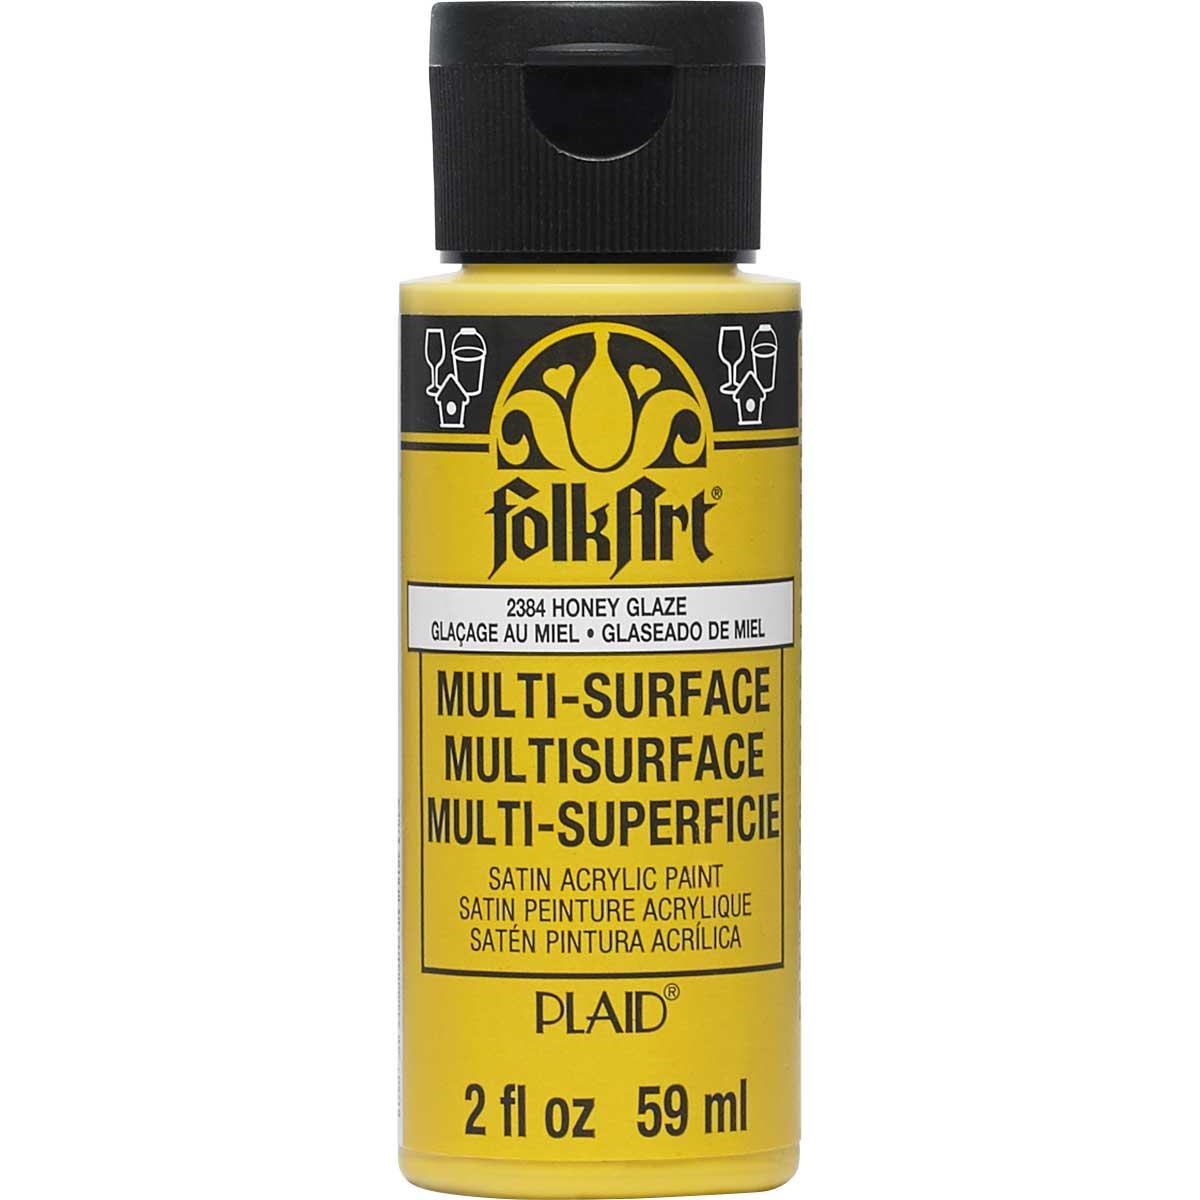 FolkArt ® Multi-Surface Satin Acrylic Paints - Honey Glaze, 2 oz.